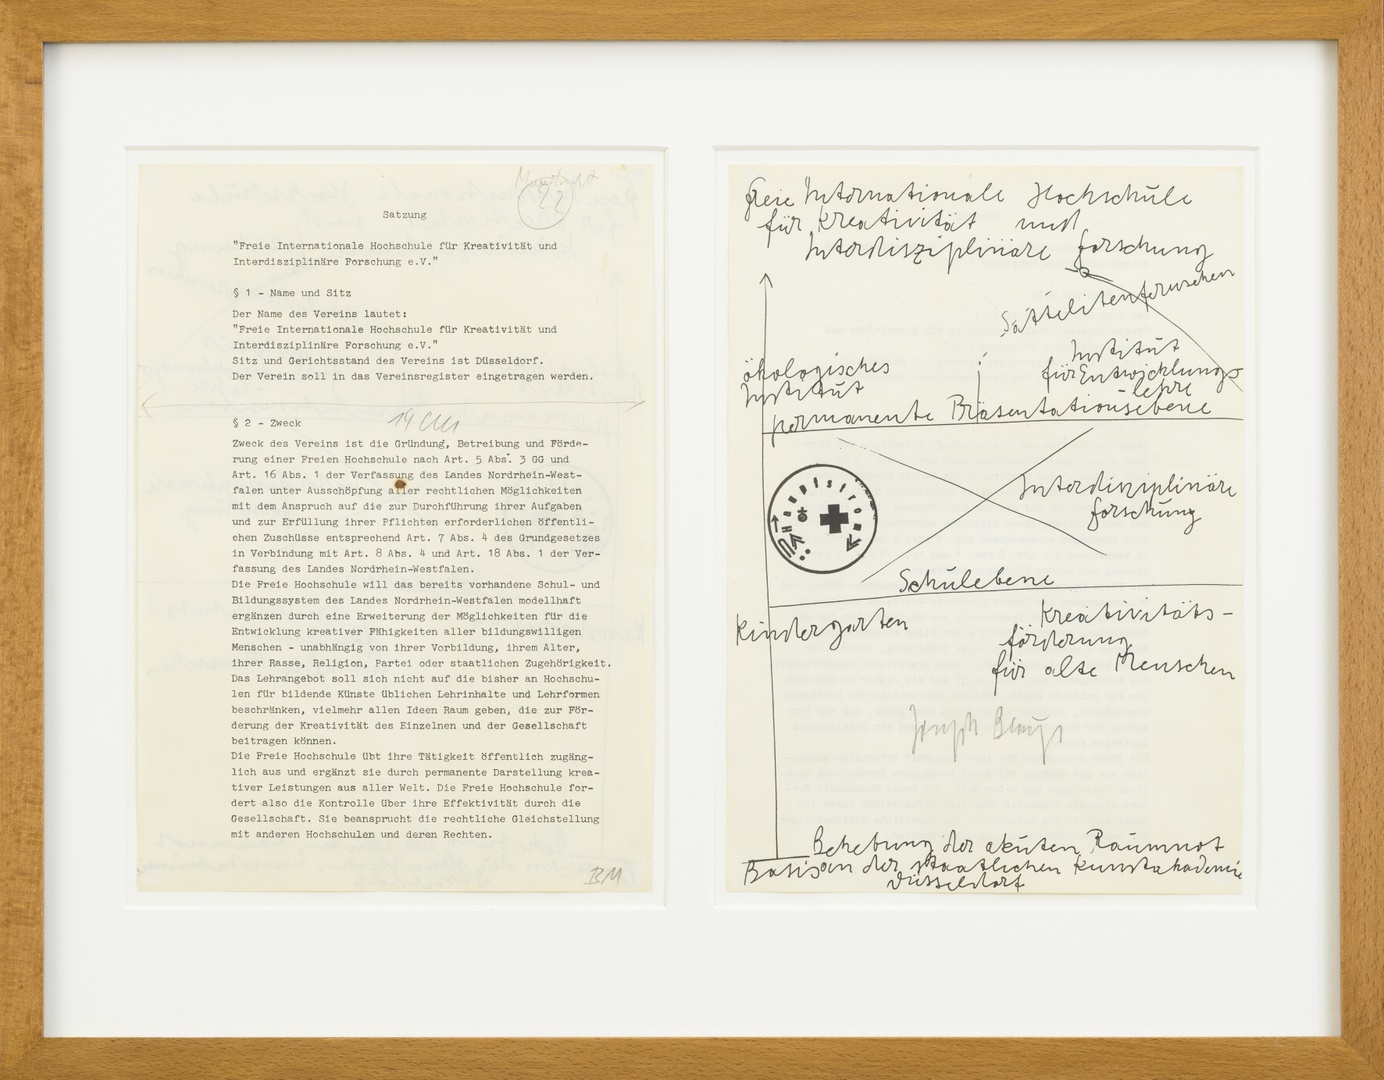 "Pamflet/statuten: Satzung; ""Freie Internationale Hochschule für Kreativität und Interdisziplinäre Forschung e. V."", no 1 en 2 van de statuten."